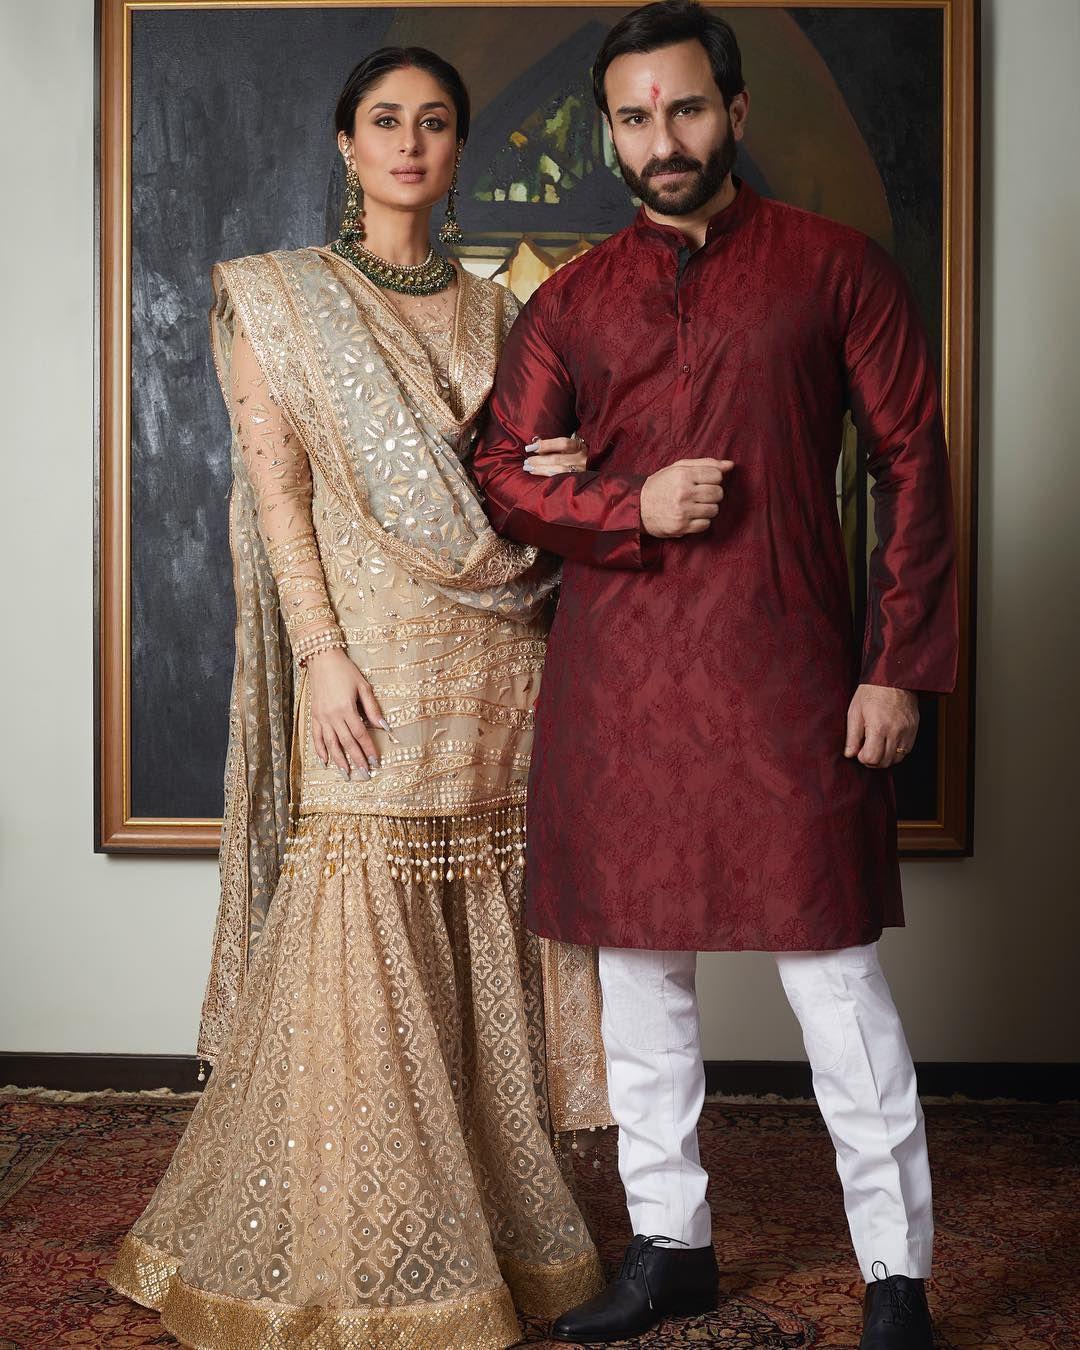 12 Best Saif Ali Khan Kurta Pajama Men Wedding Dress Men Ideas Saif Ali Khan Kurta Wedding Dress Men Kurta Pajama Men Previous   next view all. 12 best saif ali khan kurta pajama men